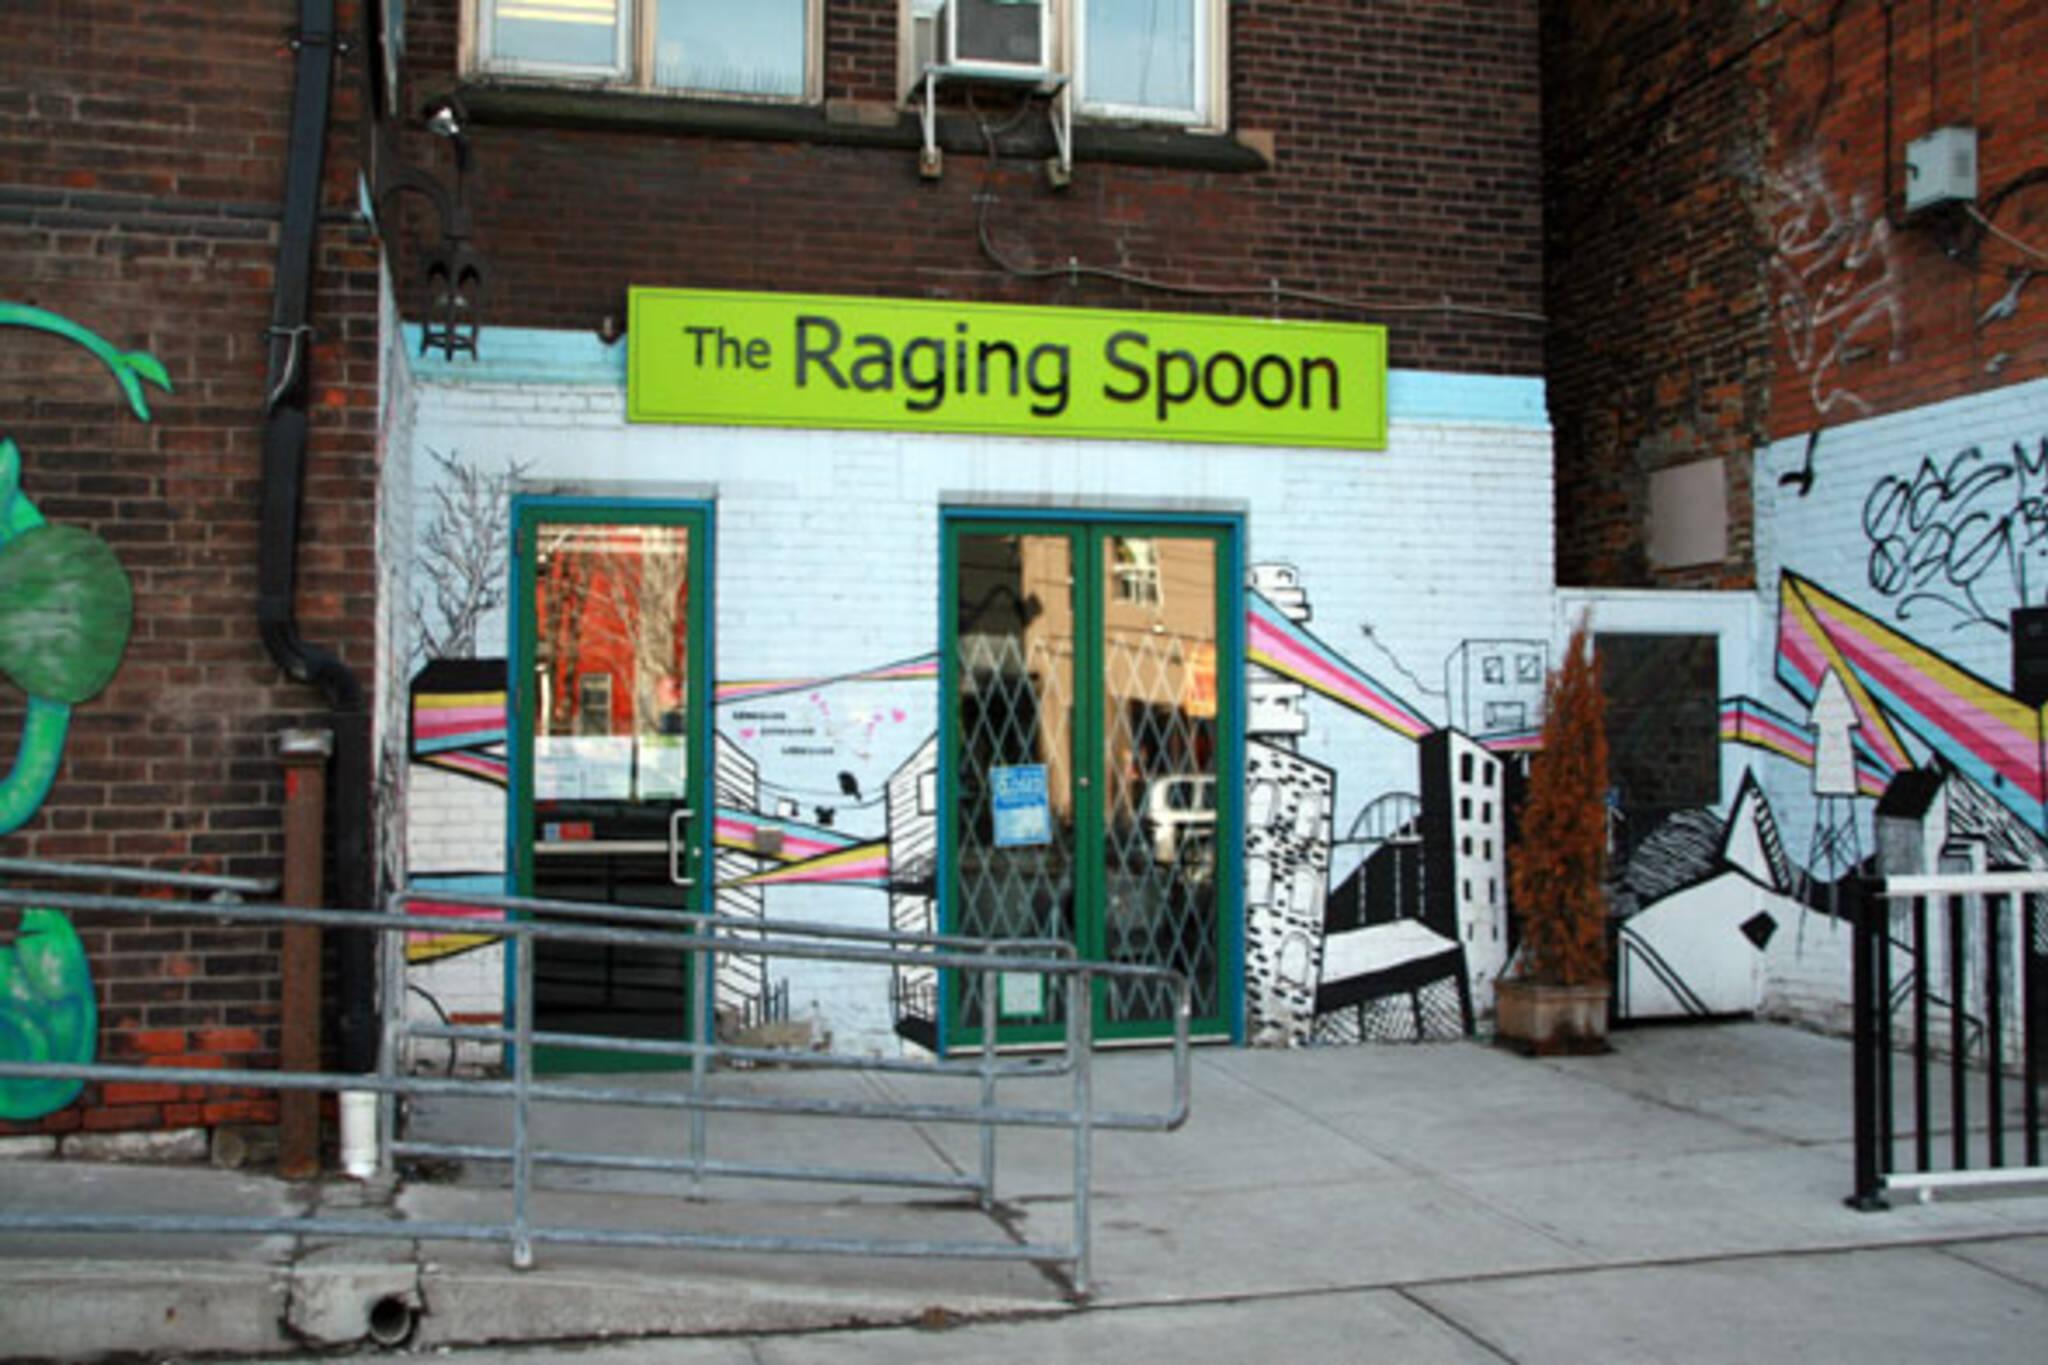 Raging Spoon